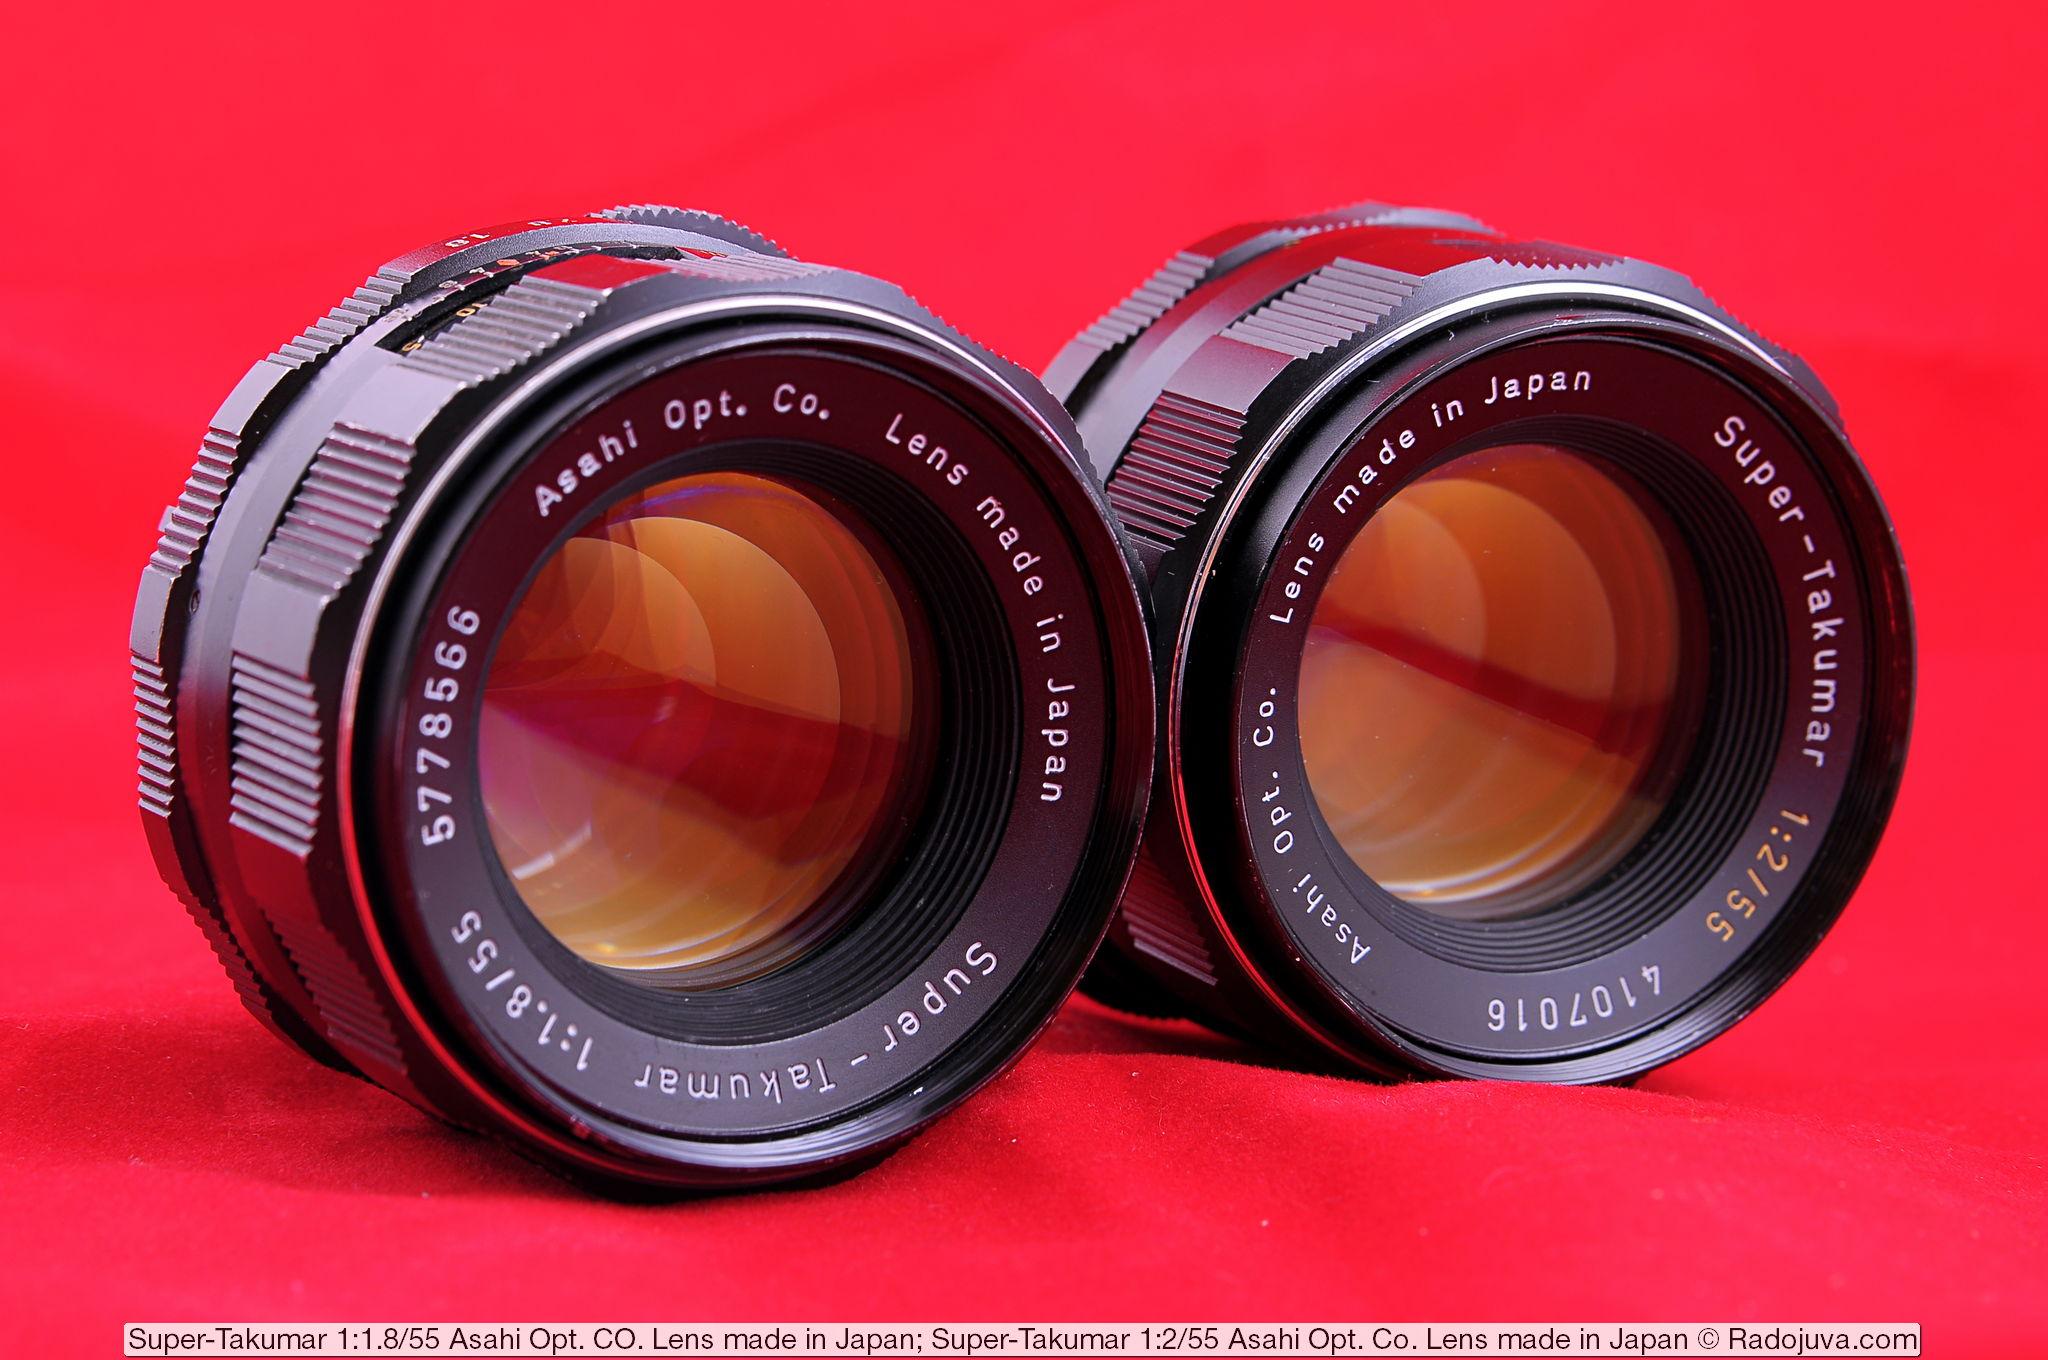 Объективы Super-Takumar 1:1.8/55 Asahi Opt. Co. Lens made in Japan и Super-Takumar 1:2/55 Asahi Opt. Co. Lens made in Japan